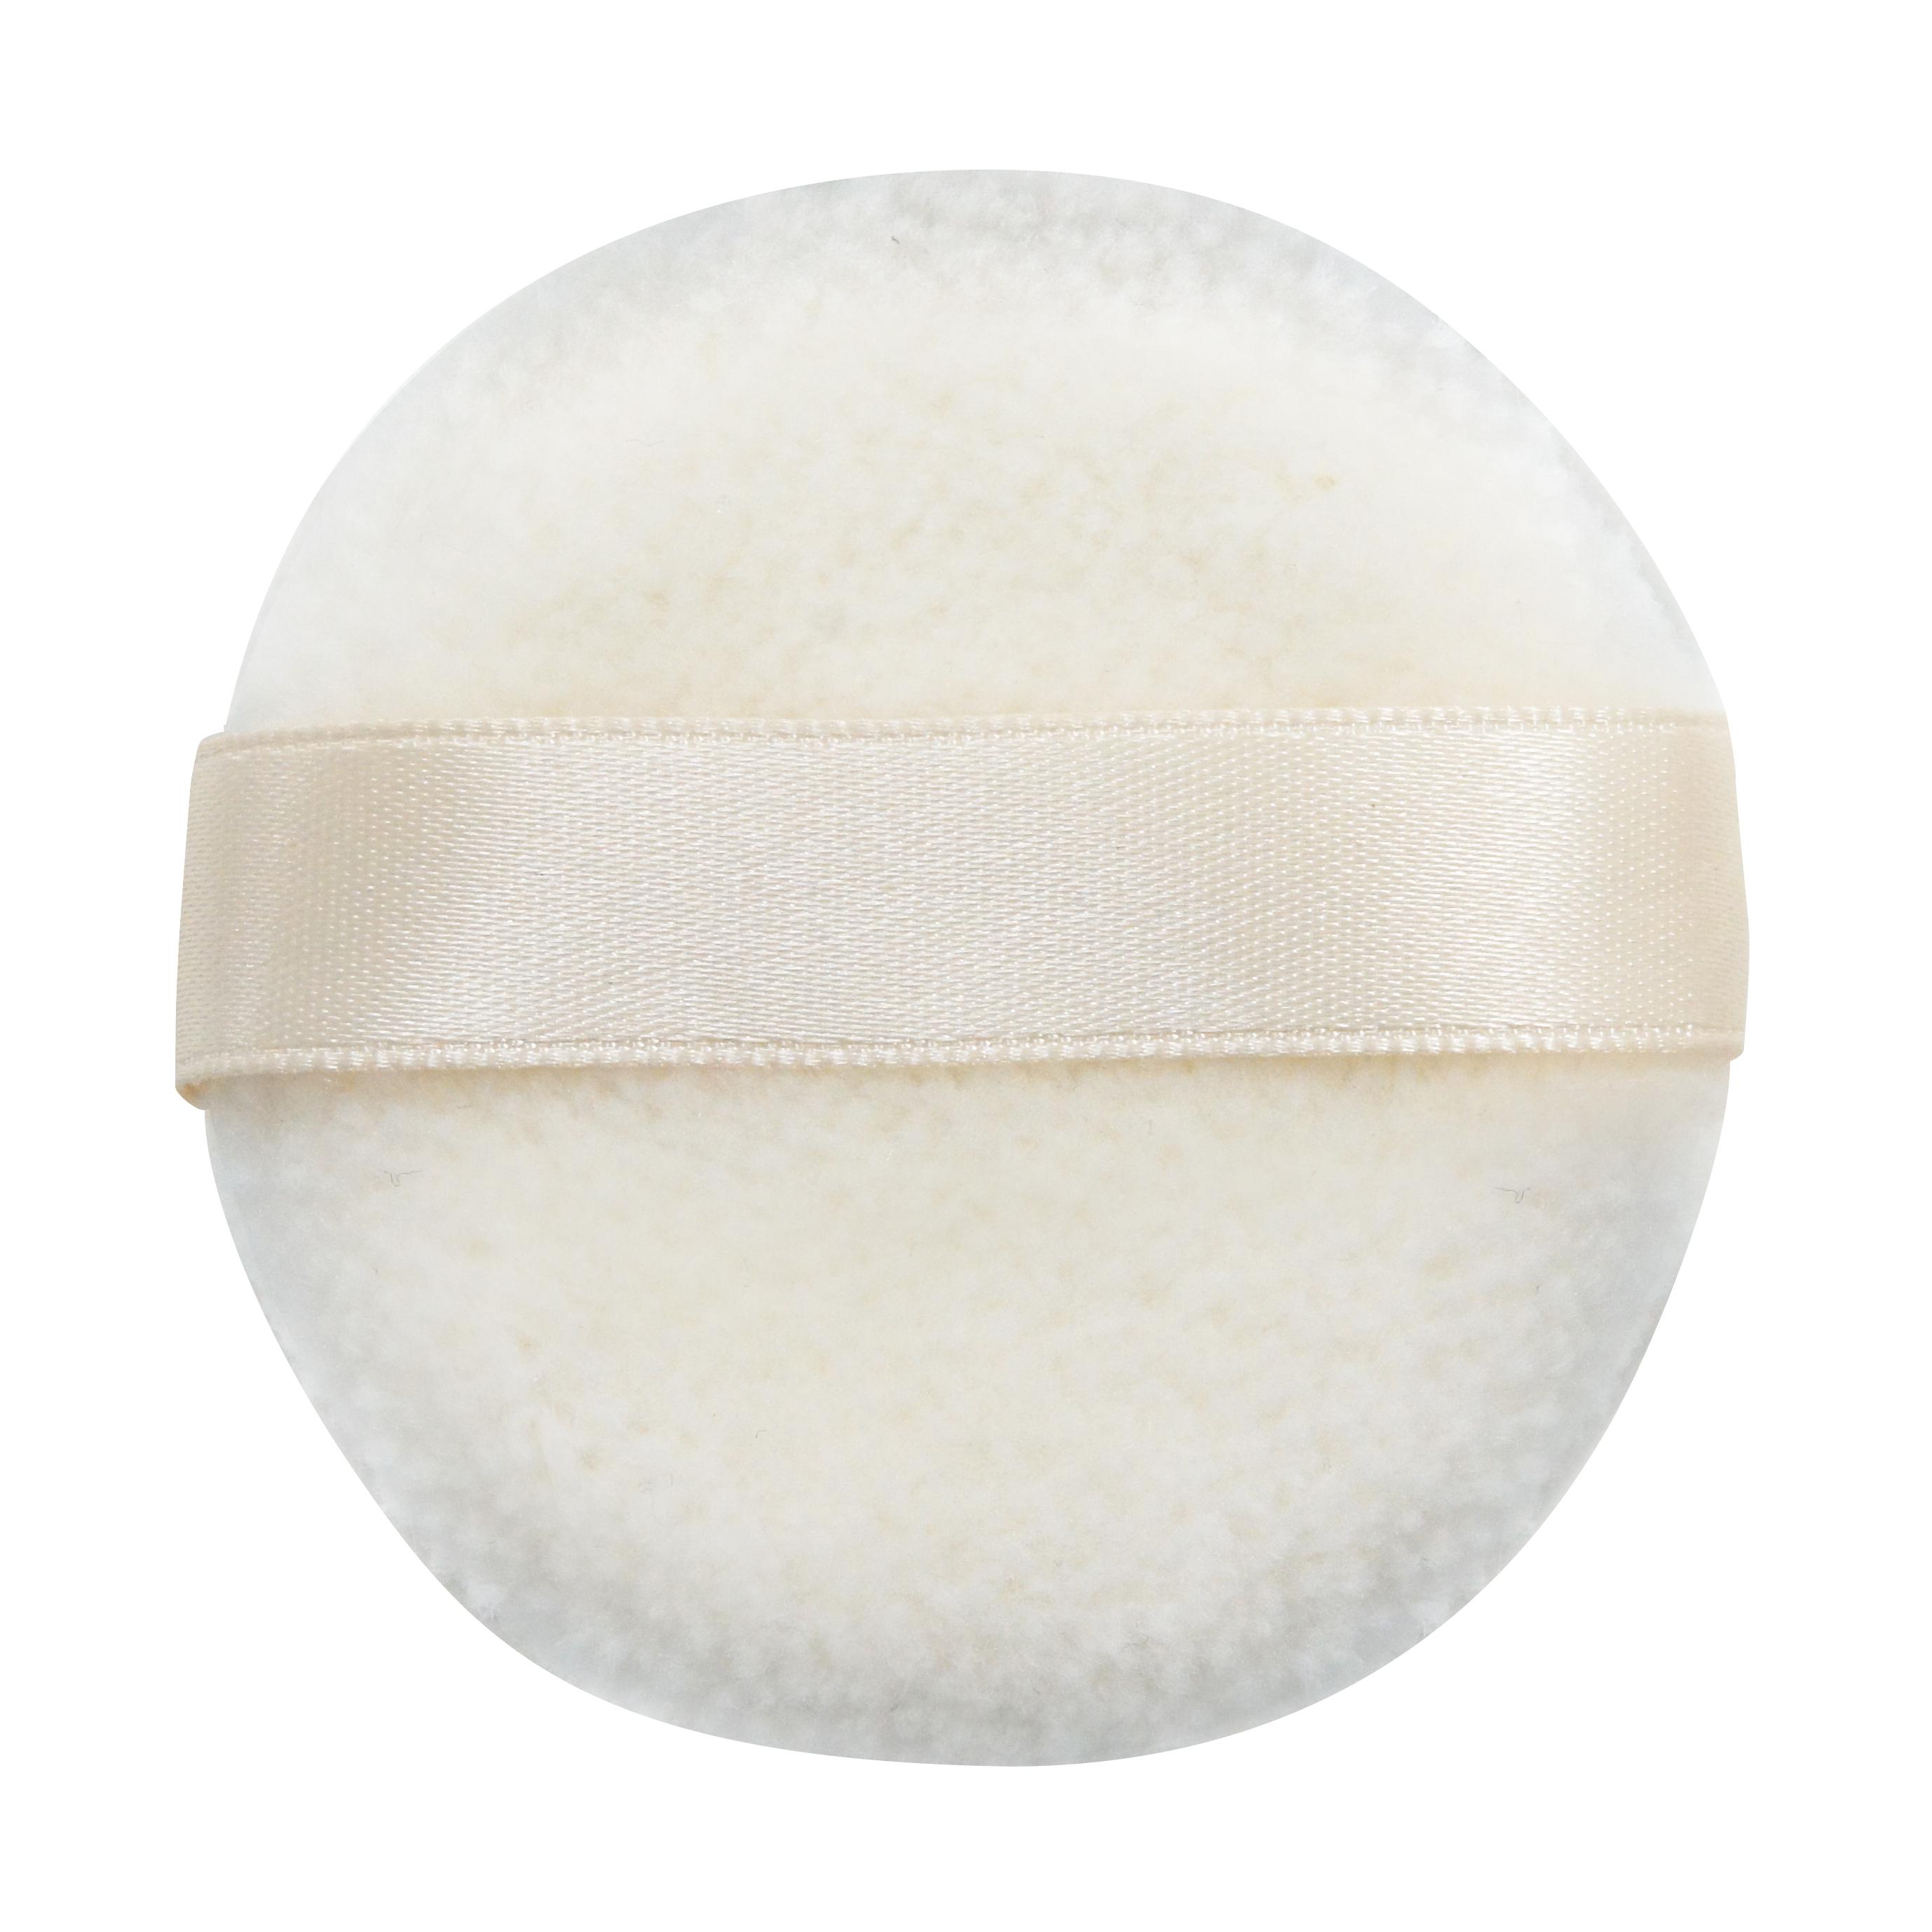 amritara スキンドレスパウダー【Face powder】